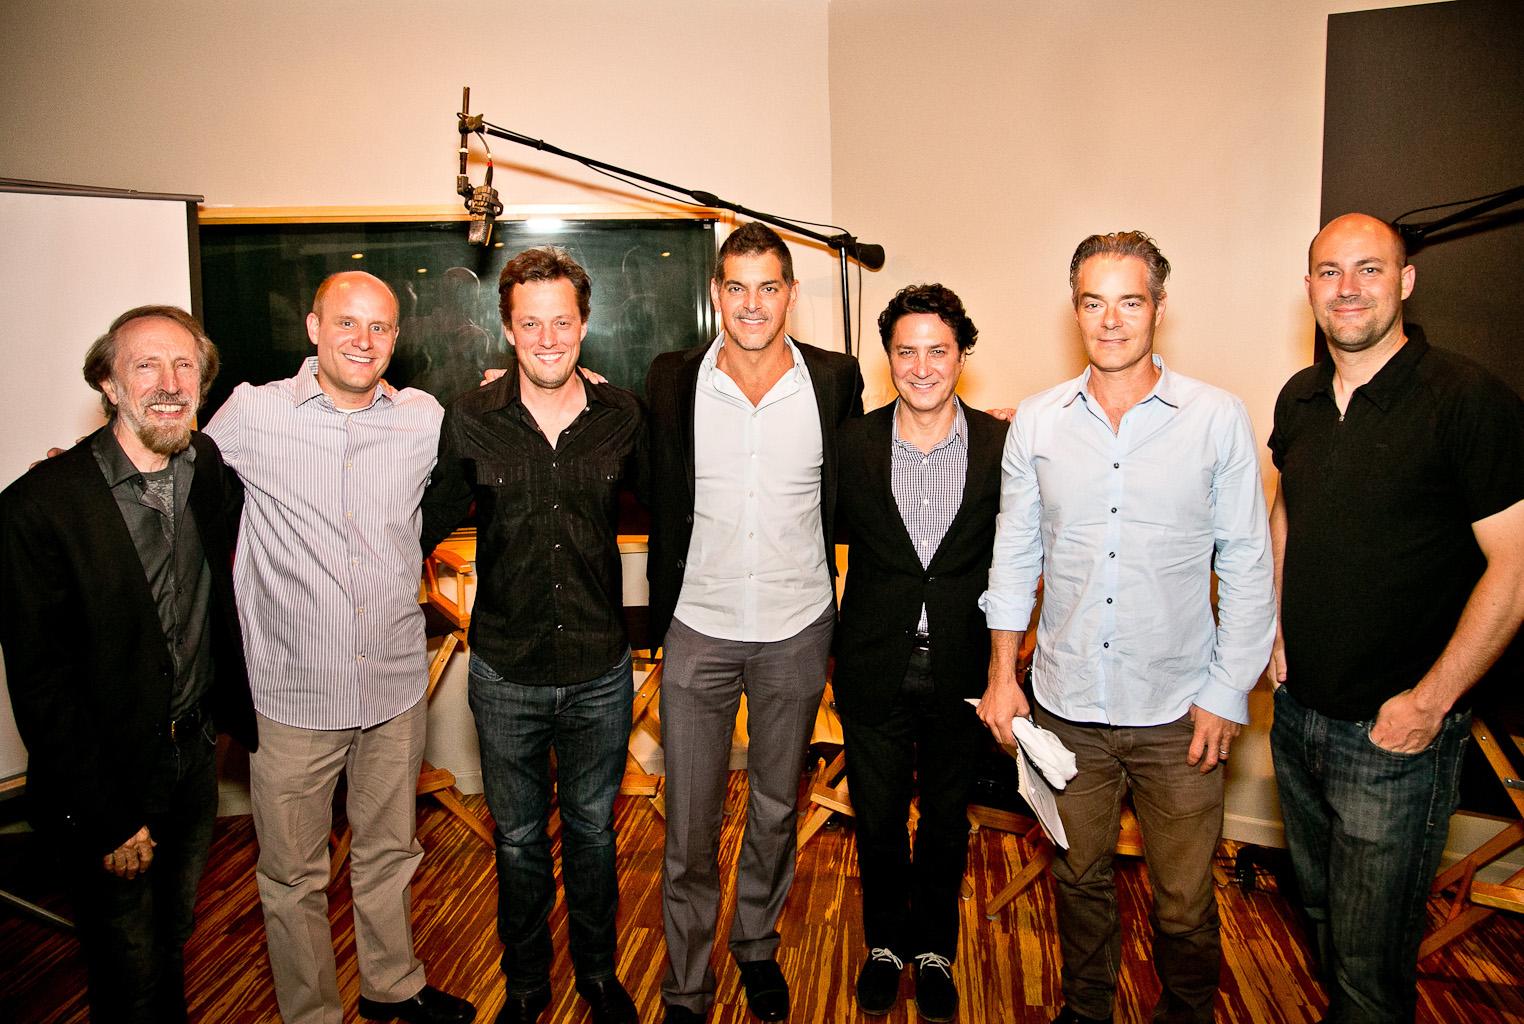 Charles Bernstein, Maestro Steven Allen Fox, Nathan Barr, Don Mancini, Joseph LoDuca, Marco Beltrami and Music Director, Victor Pesavento